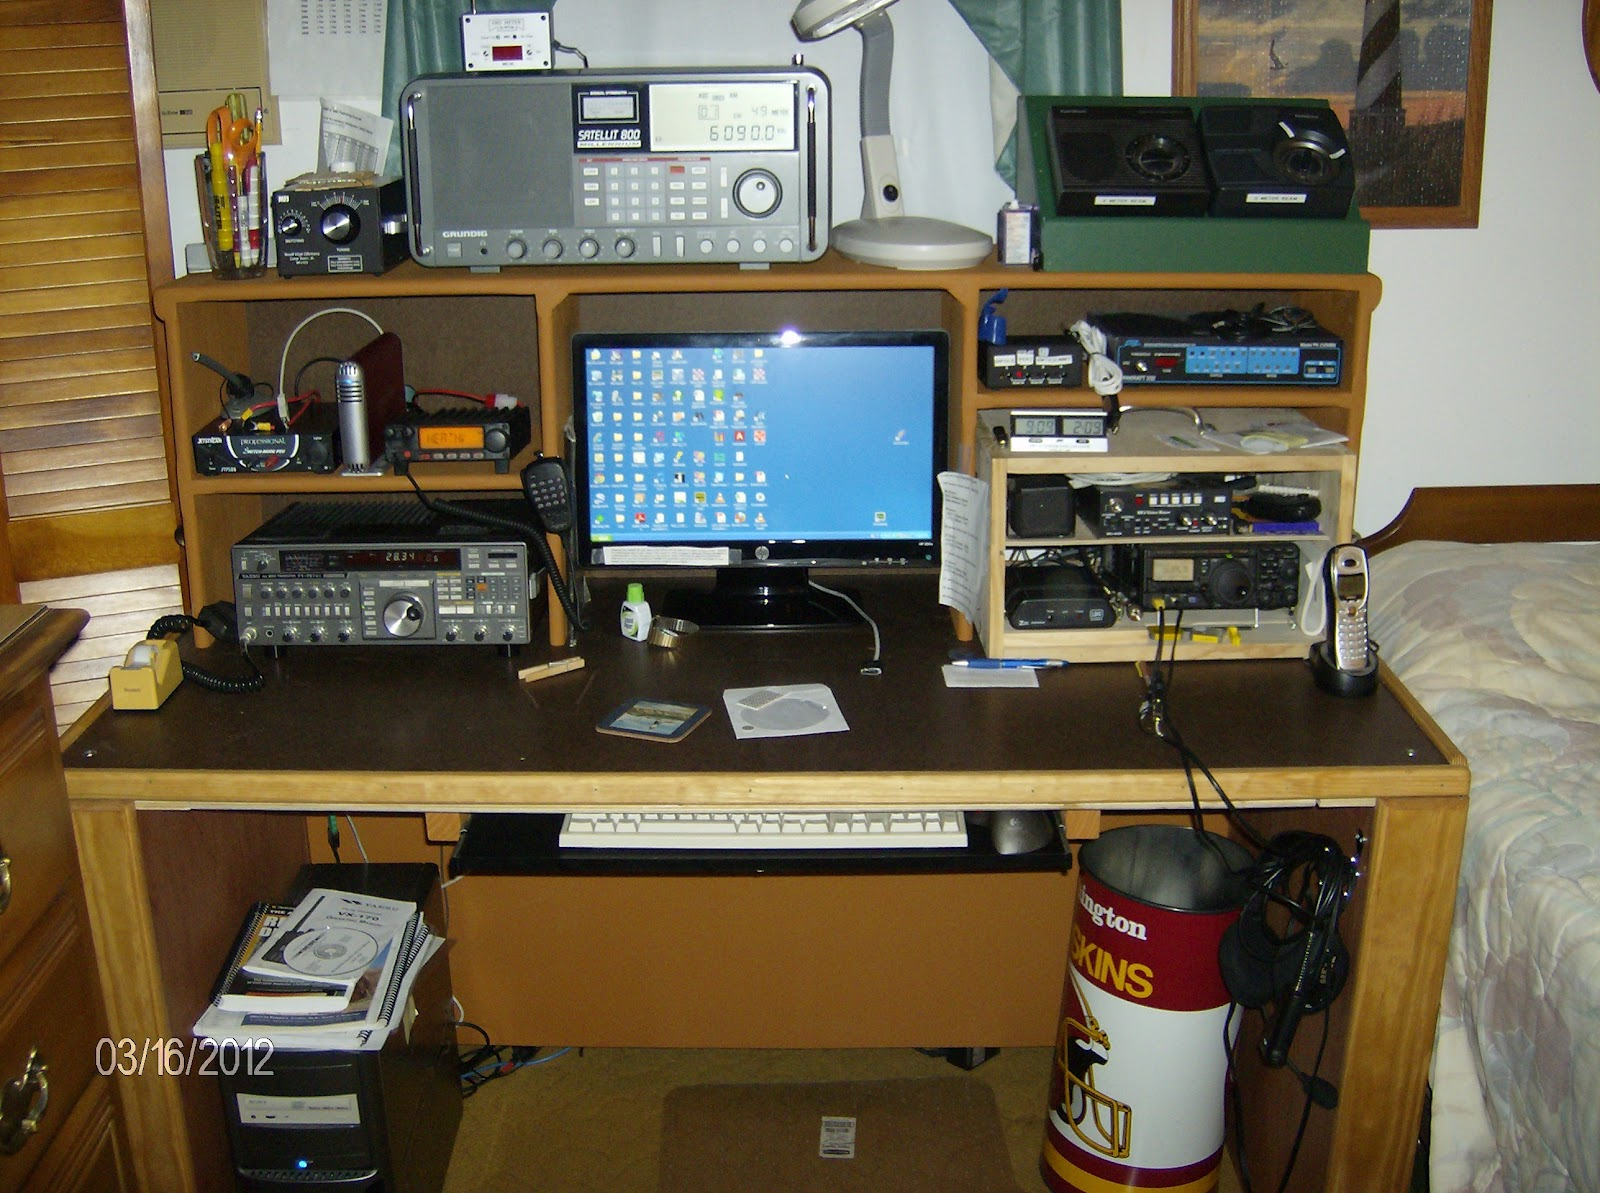 Amateur Radio Station Wb4omm: Amateur Radio Station KD4QIT